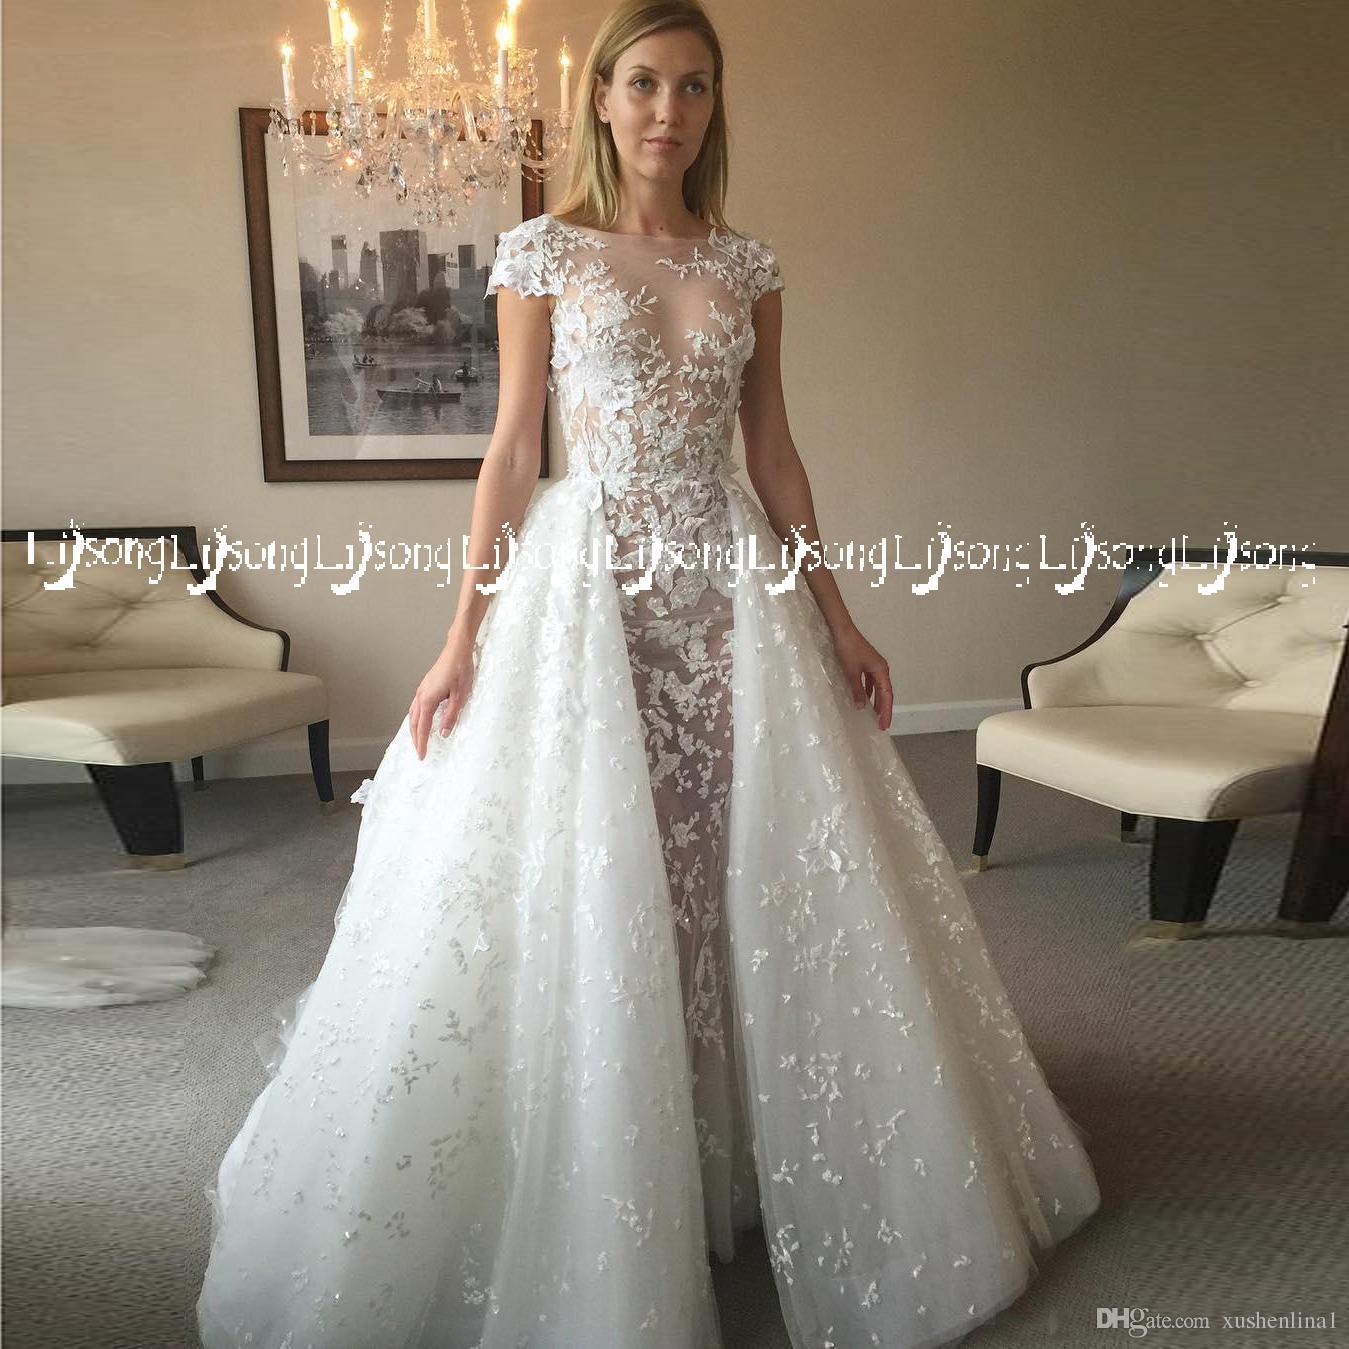 Short Sleeves Bridal Wedding Dress Vestido de Casamento Loong Train A-line Winter Brides Maxi Gowns Gorgeous Formal Party Wear Maxi Dresses